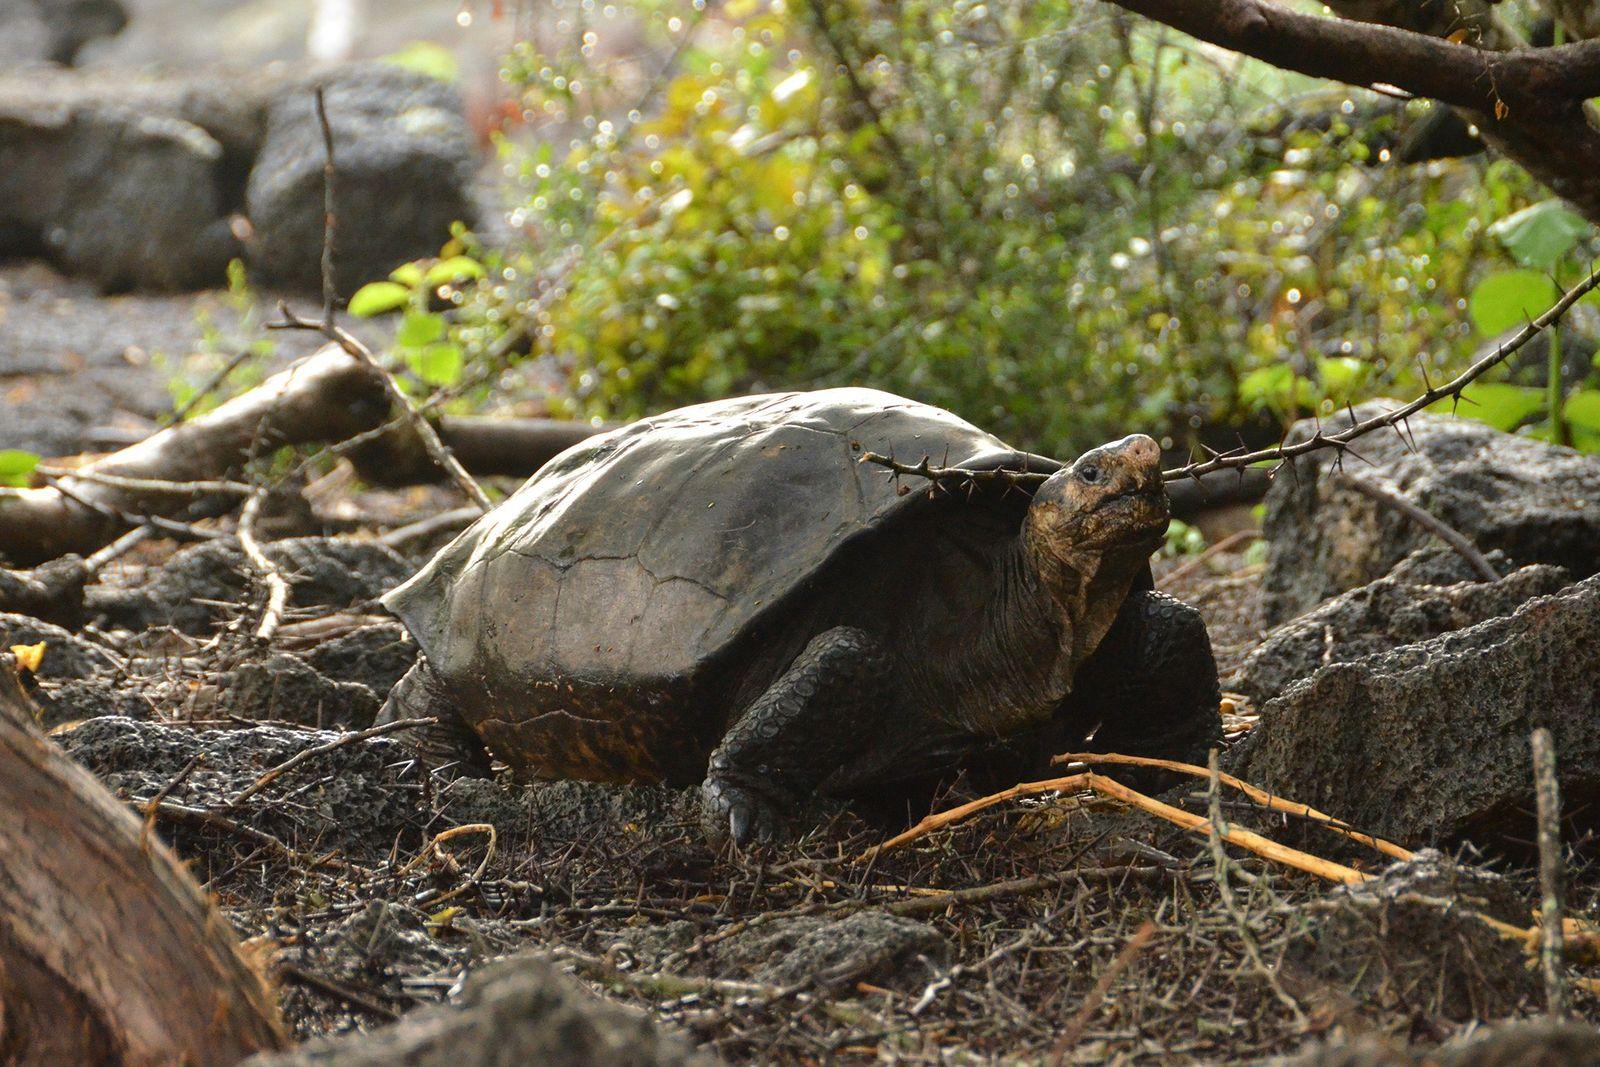 Tortuga gigante de Fernandina